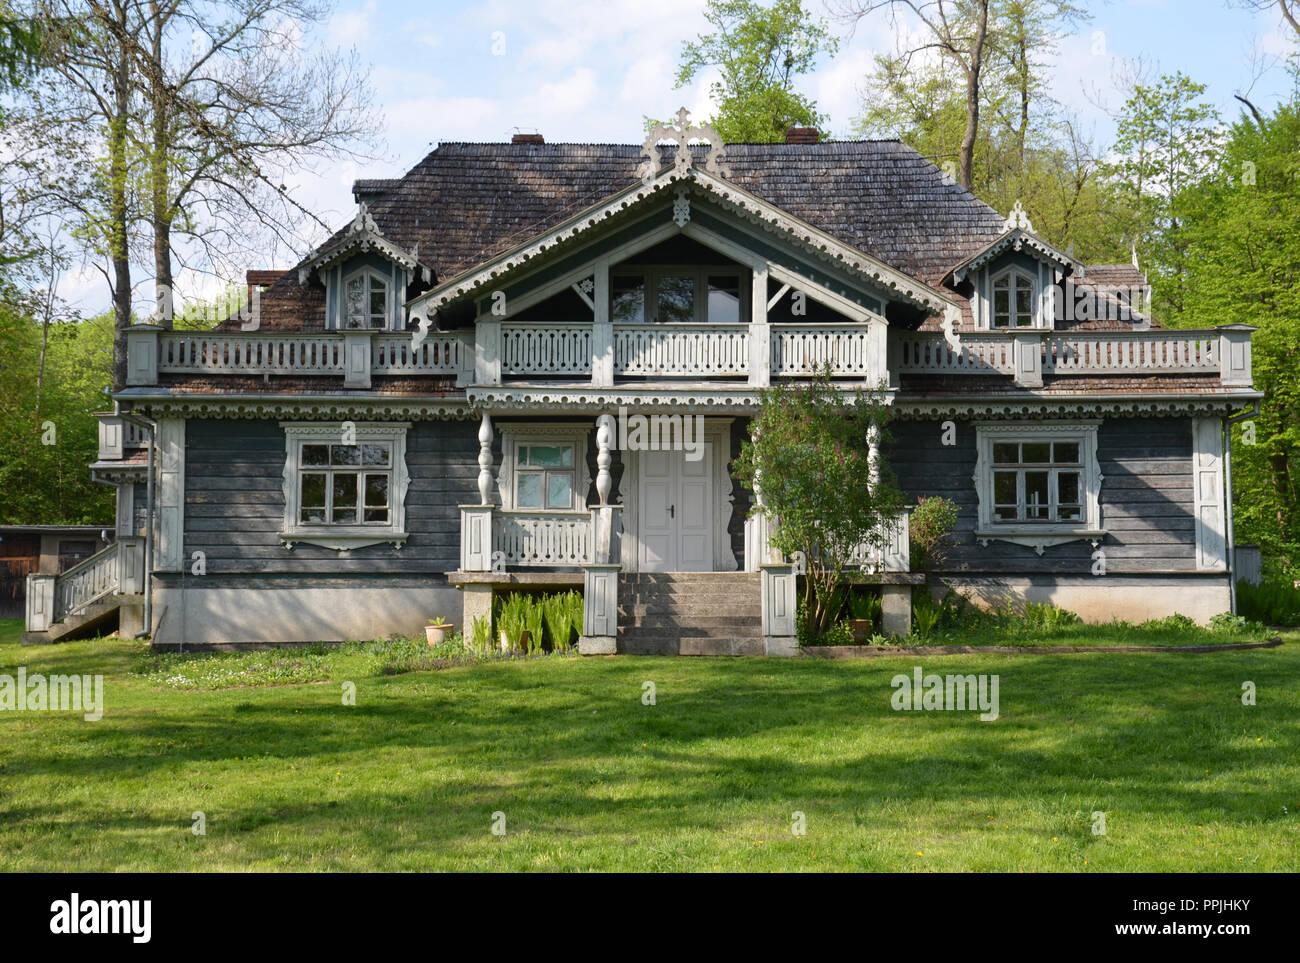 Białowieza, Podlaskie Voivodship, Poland - May 1, 2014: Hunting lodge, the oldest building in Białowieza. - Stock Image